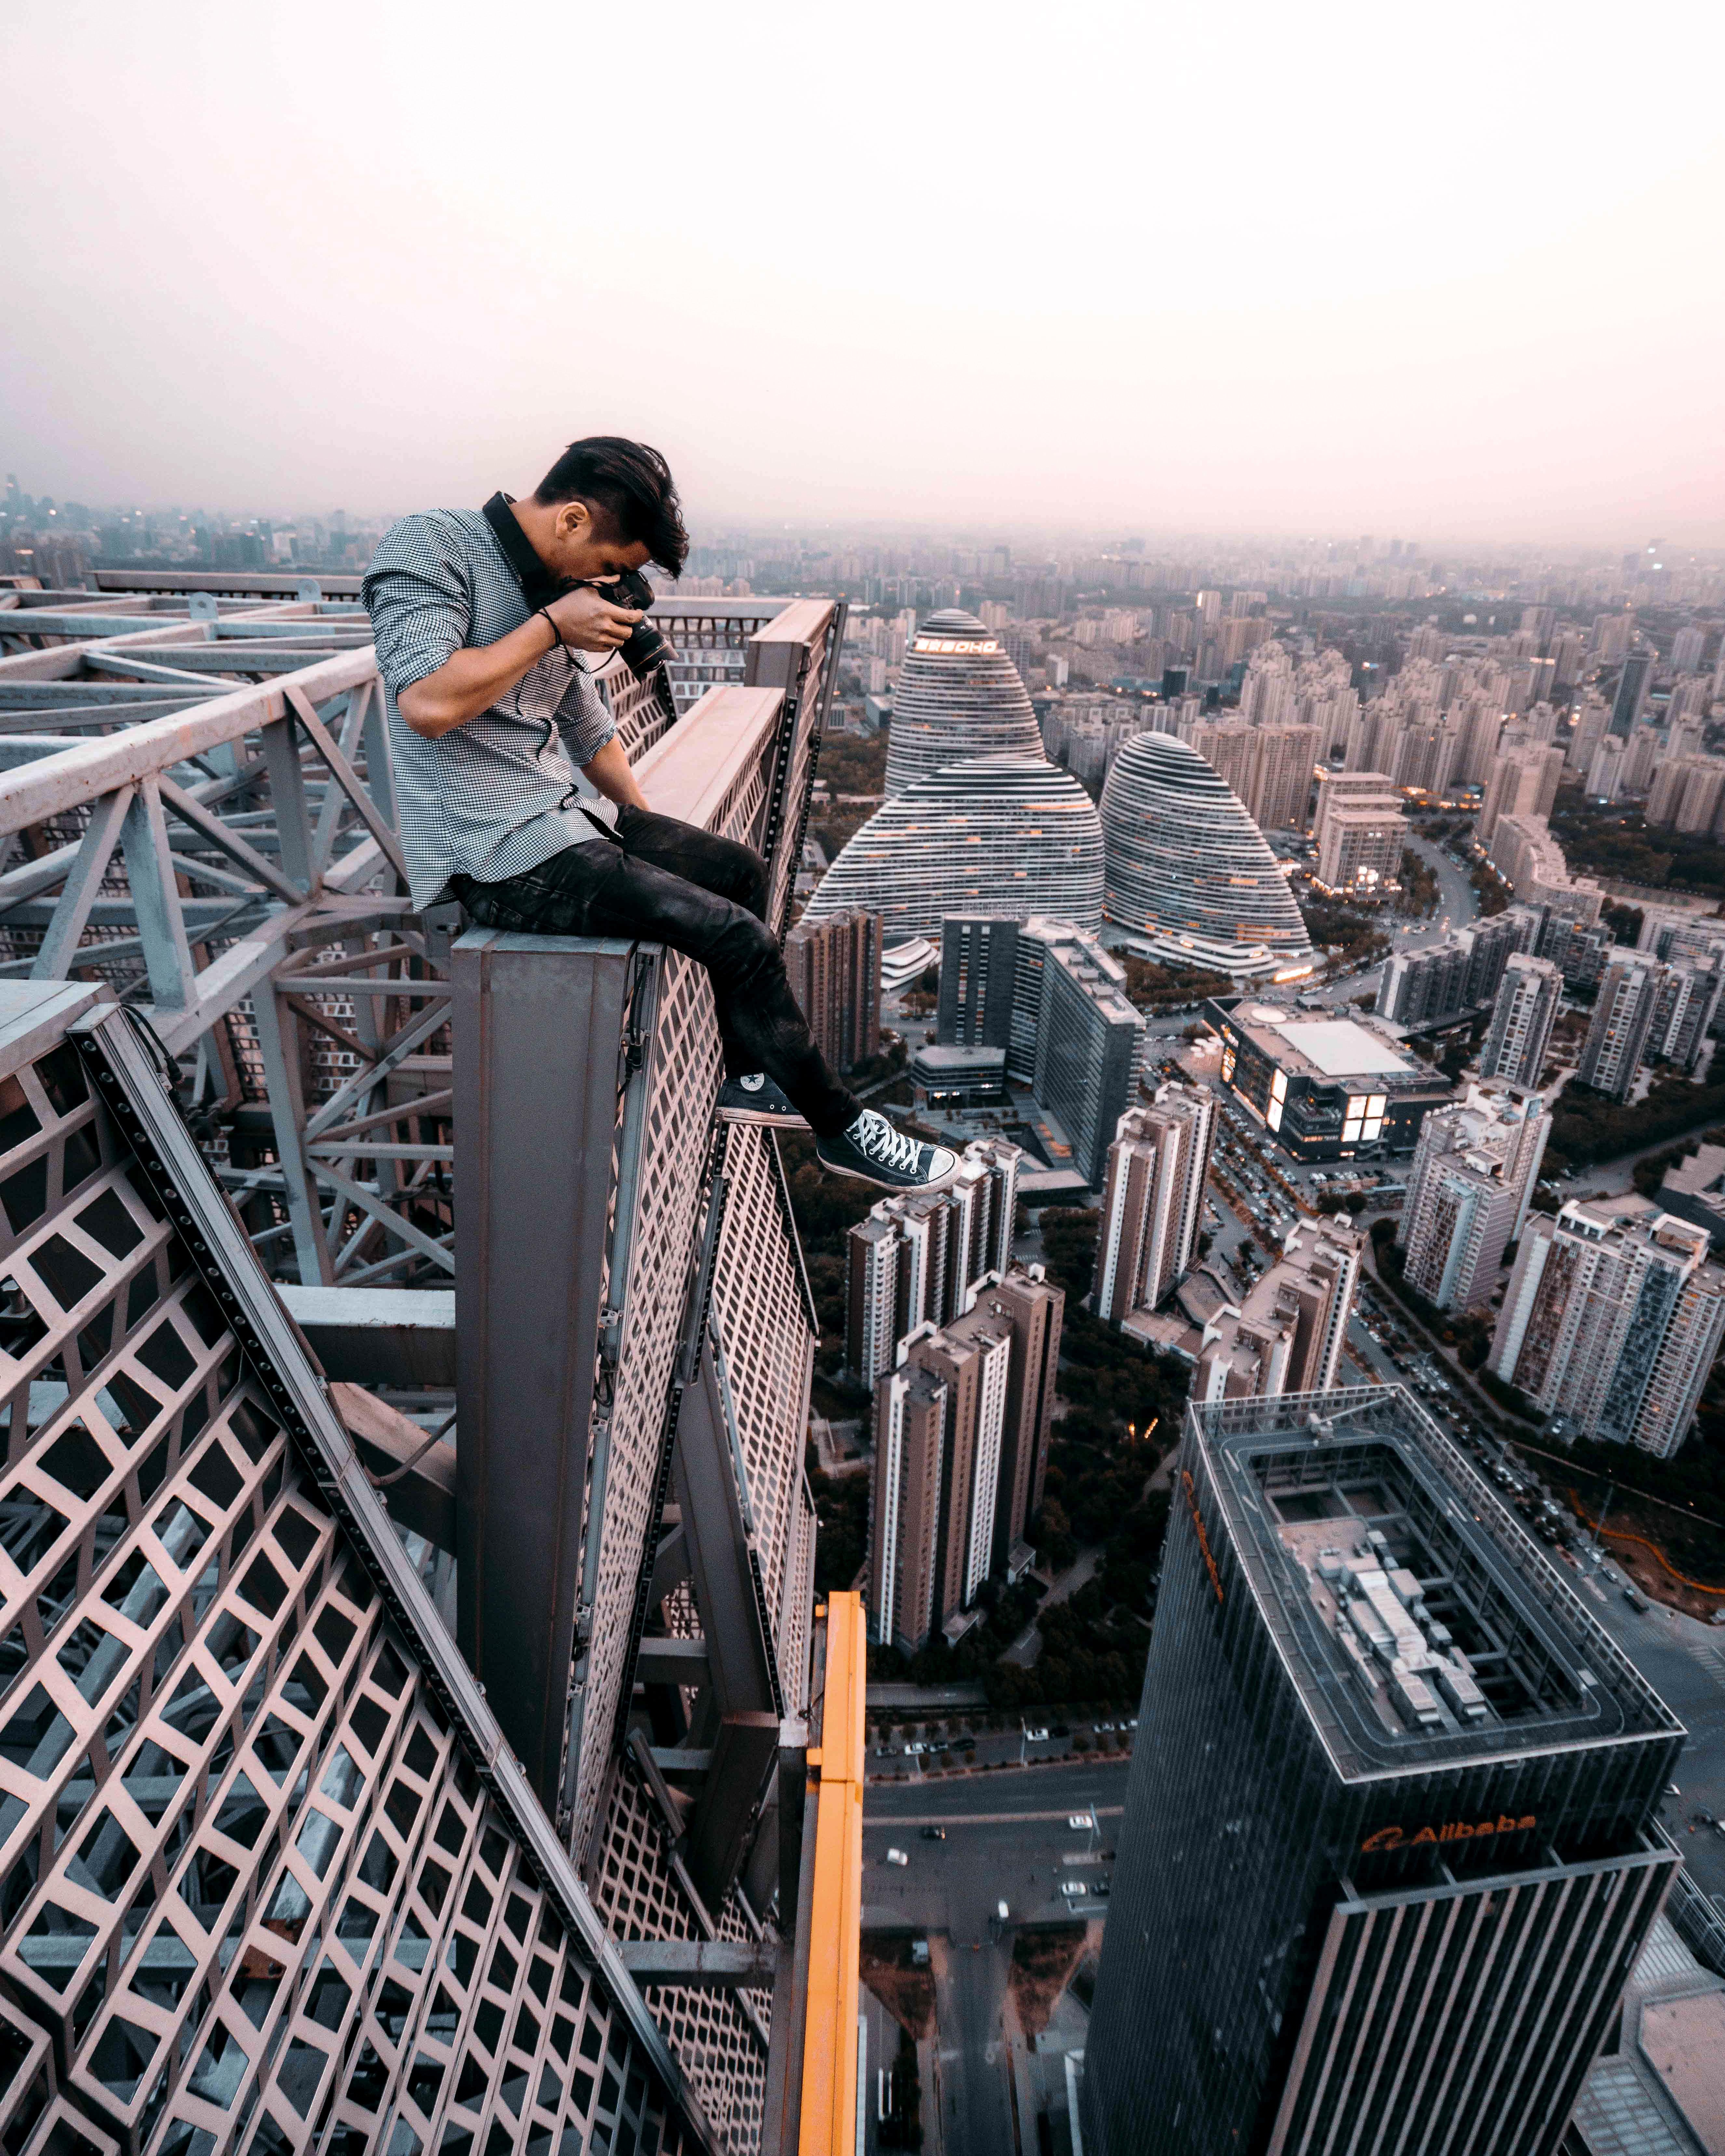 man sitting on top of building taking photo below